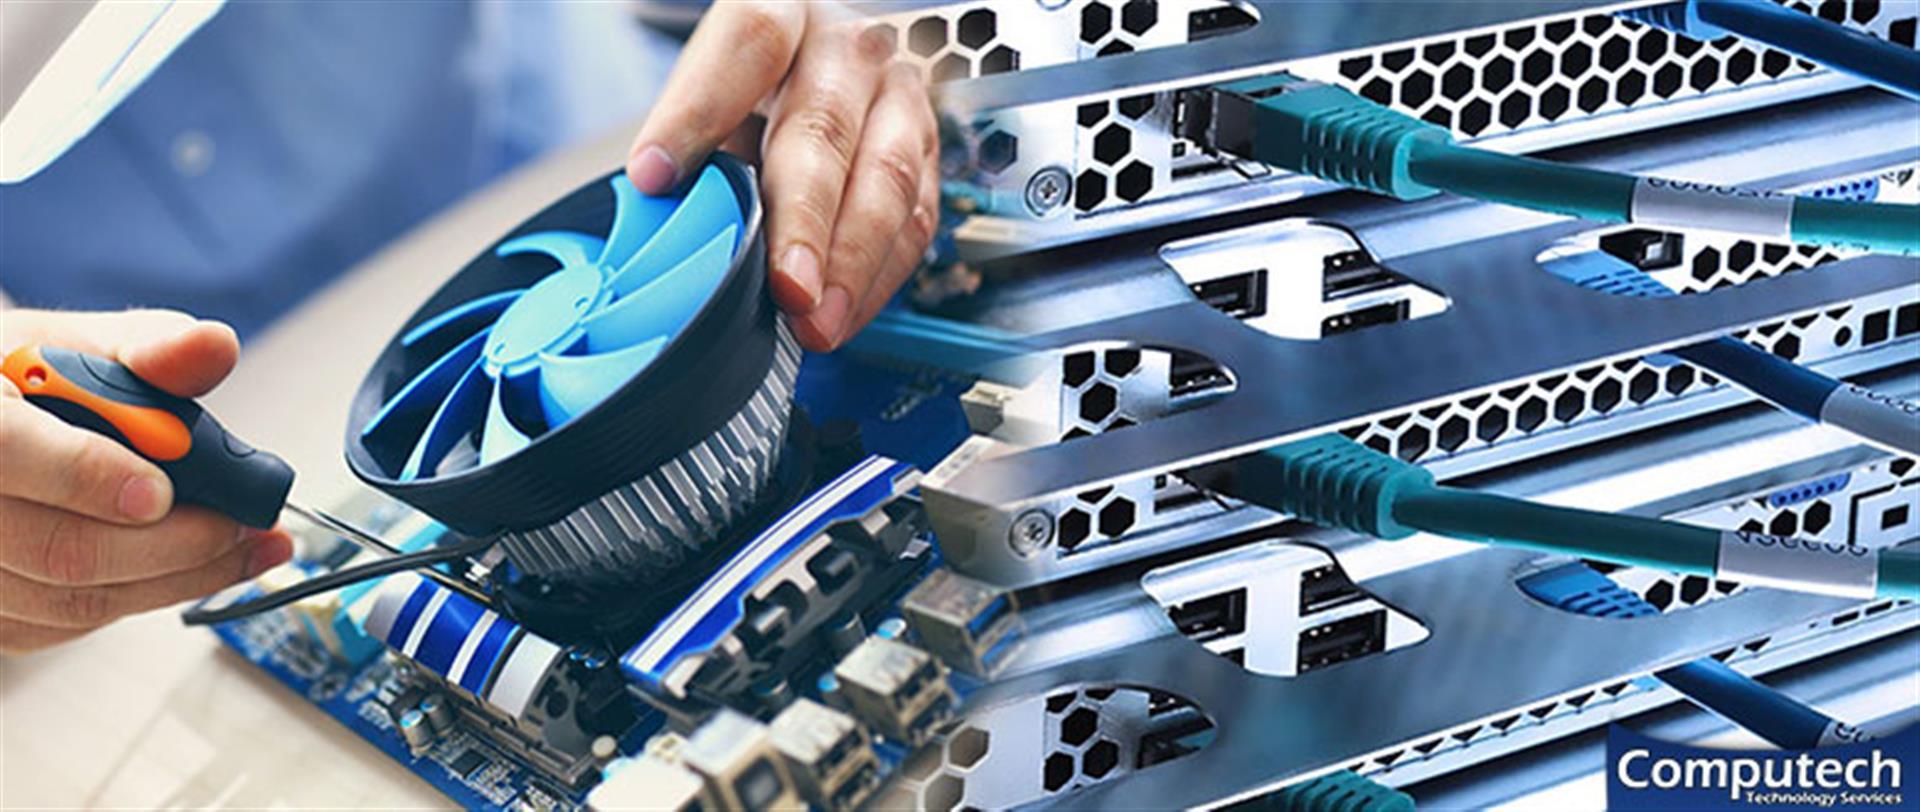 Lexington Virginia Onsite Computer & Printer Repair, Networking, Voice & Data Cabling Contractors